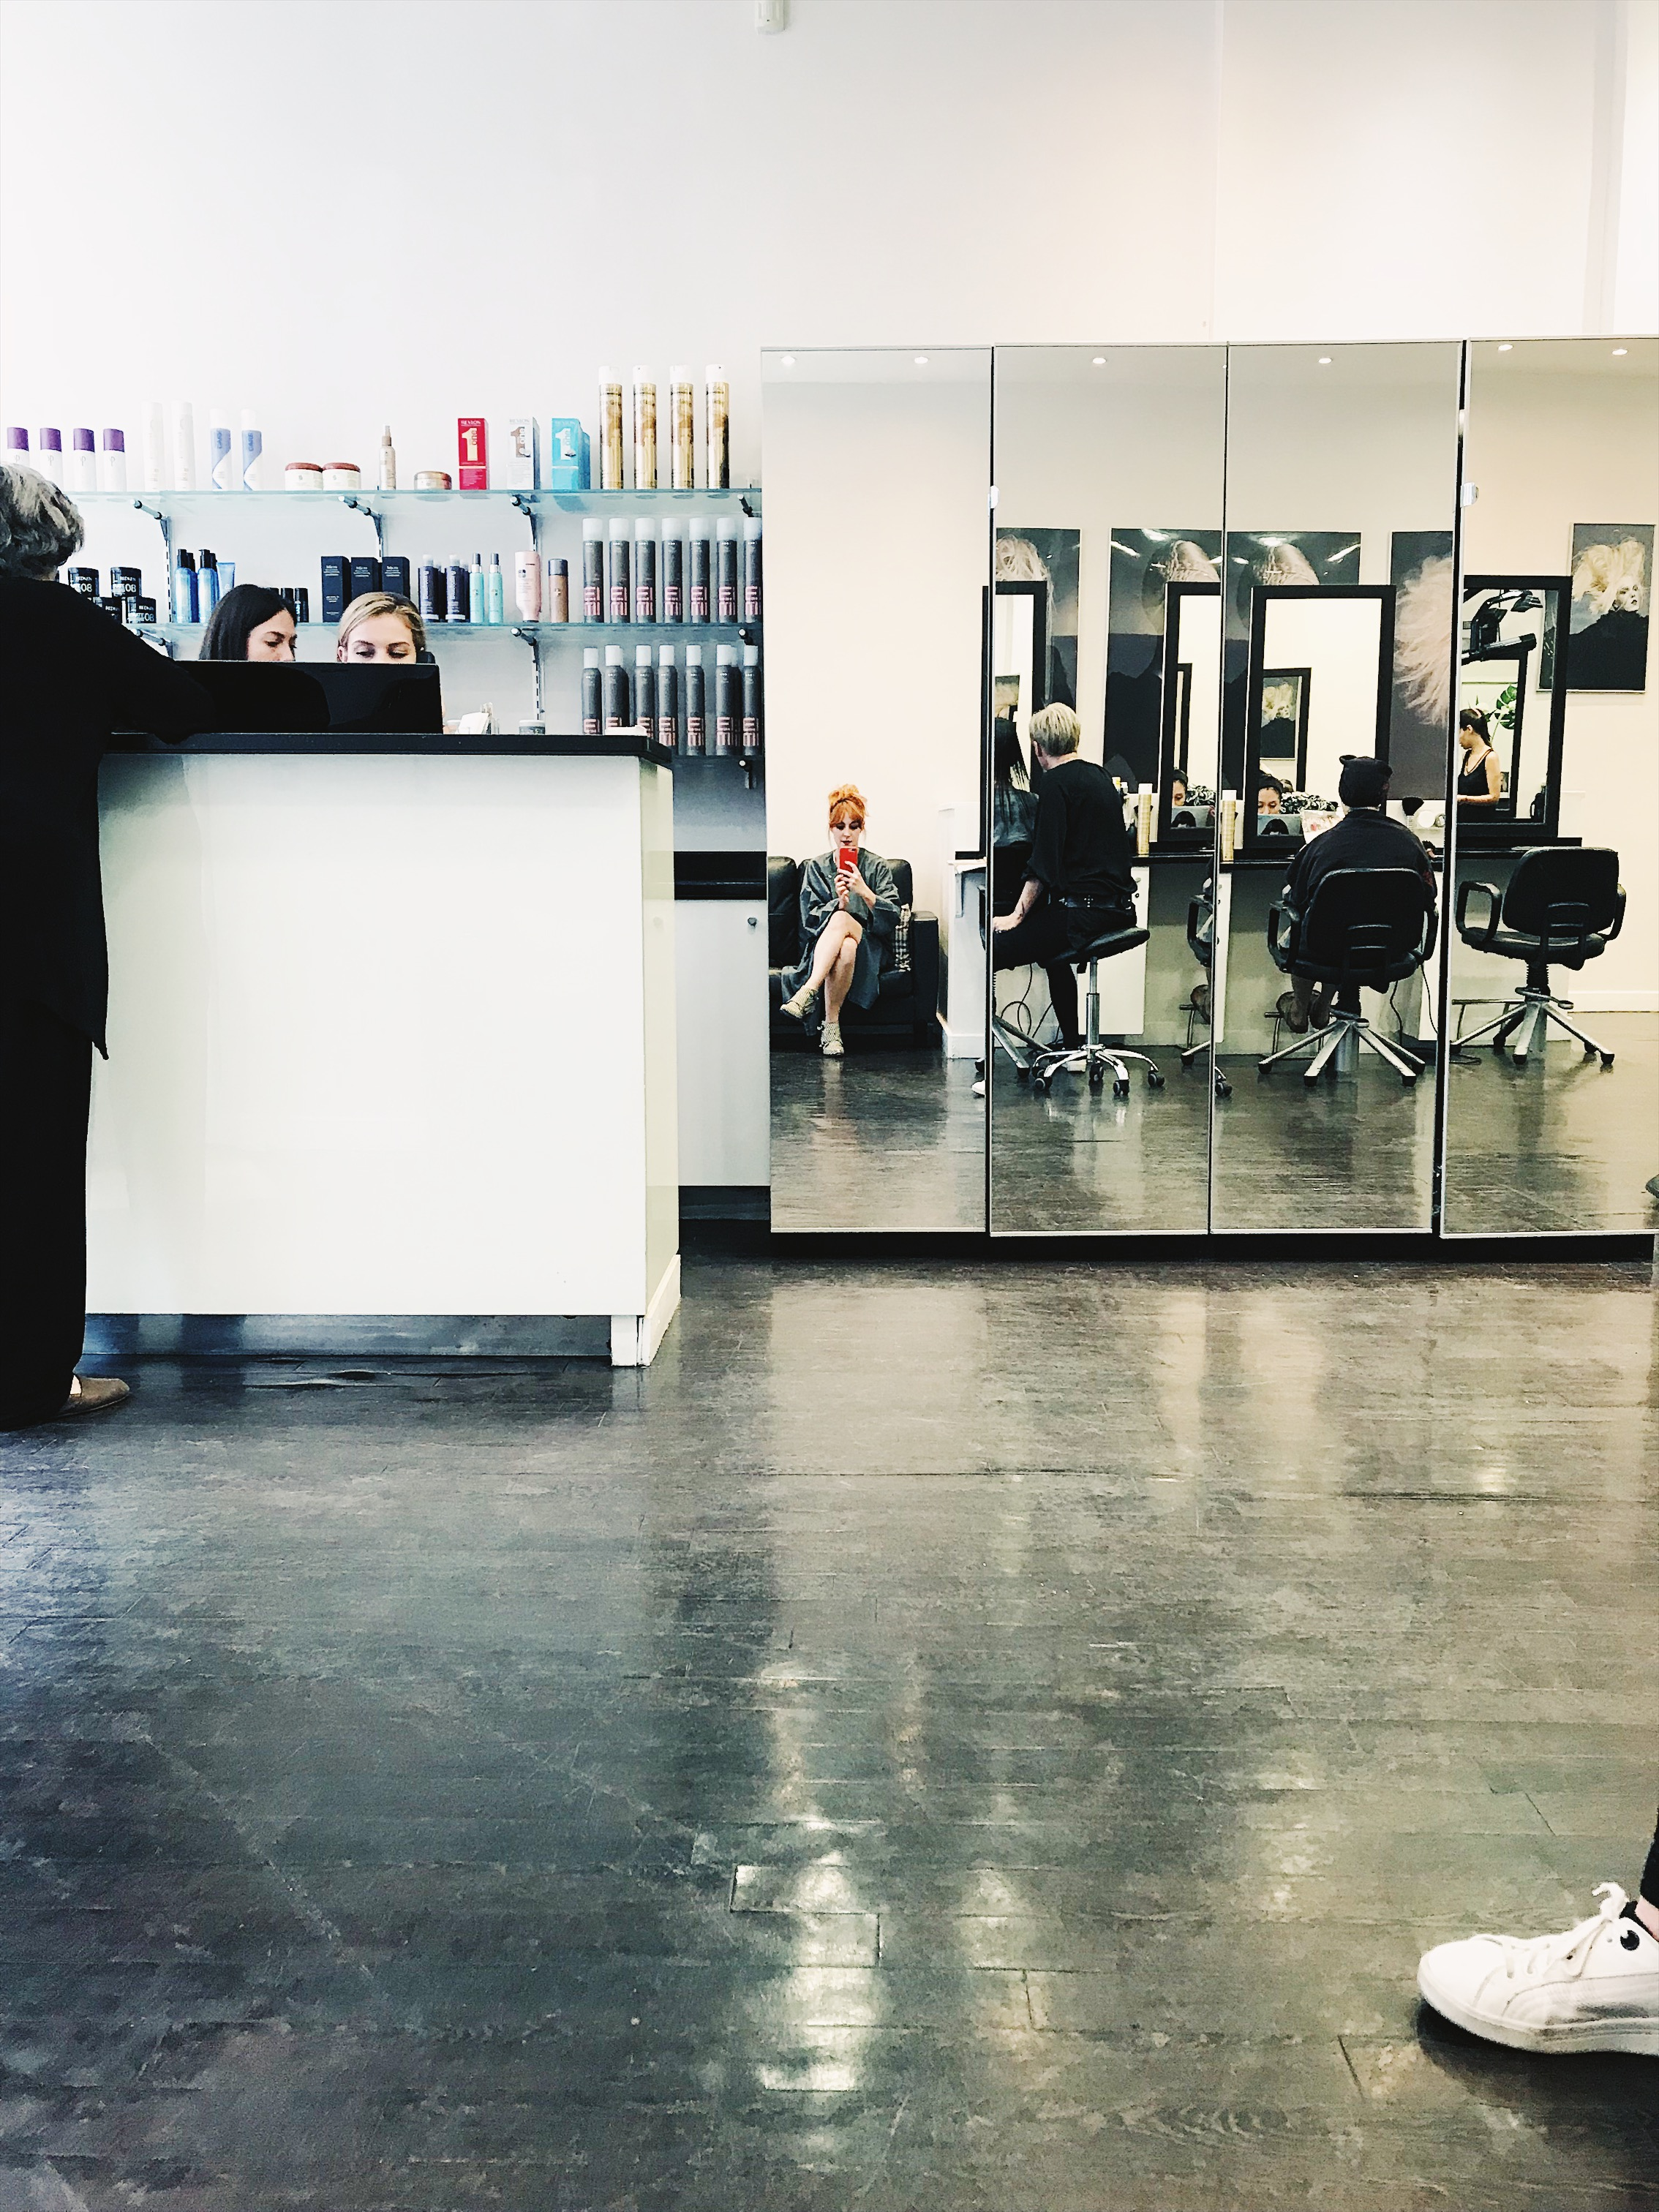 Waiting for my hair transformation at Steven Carey Hair, London